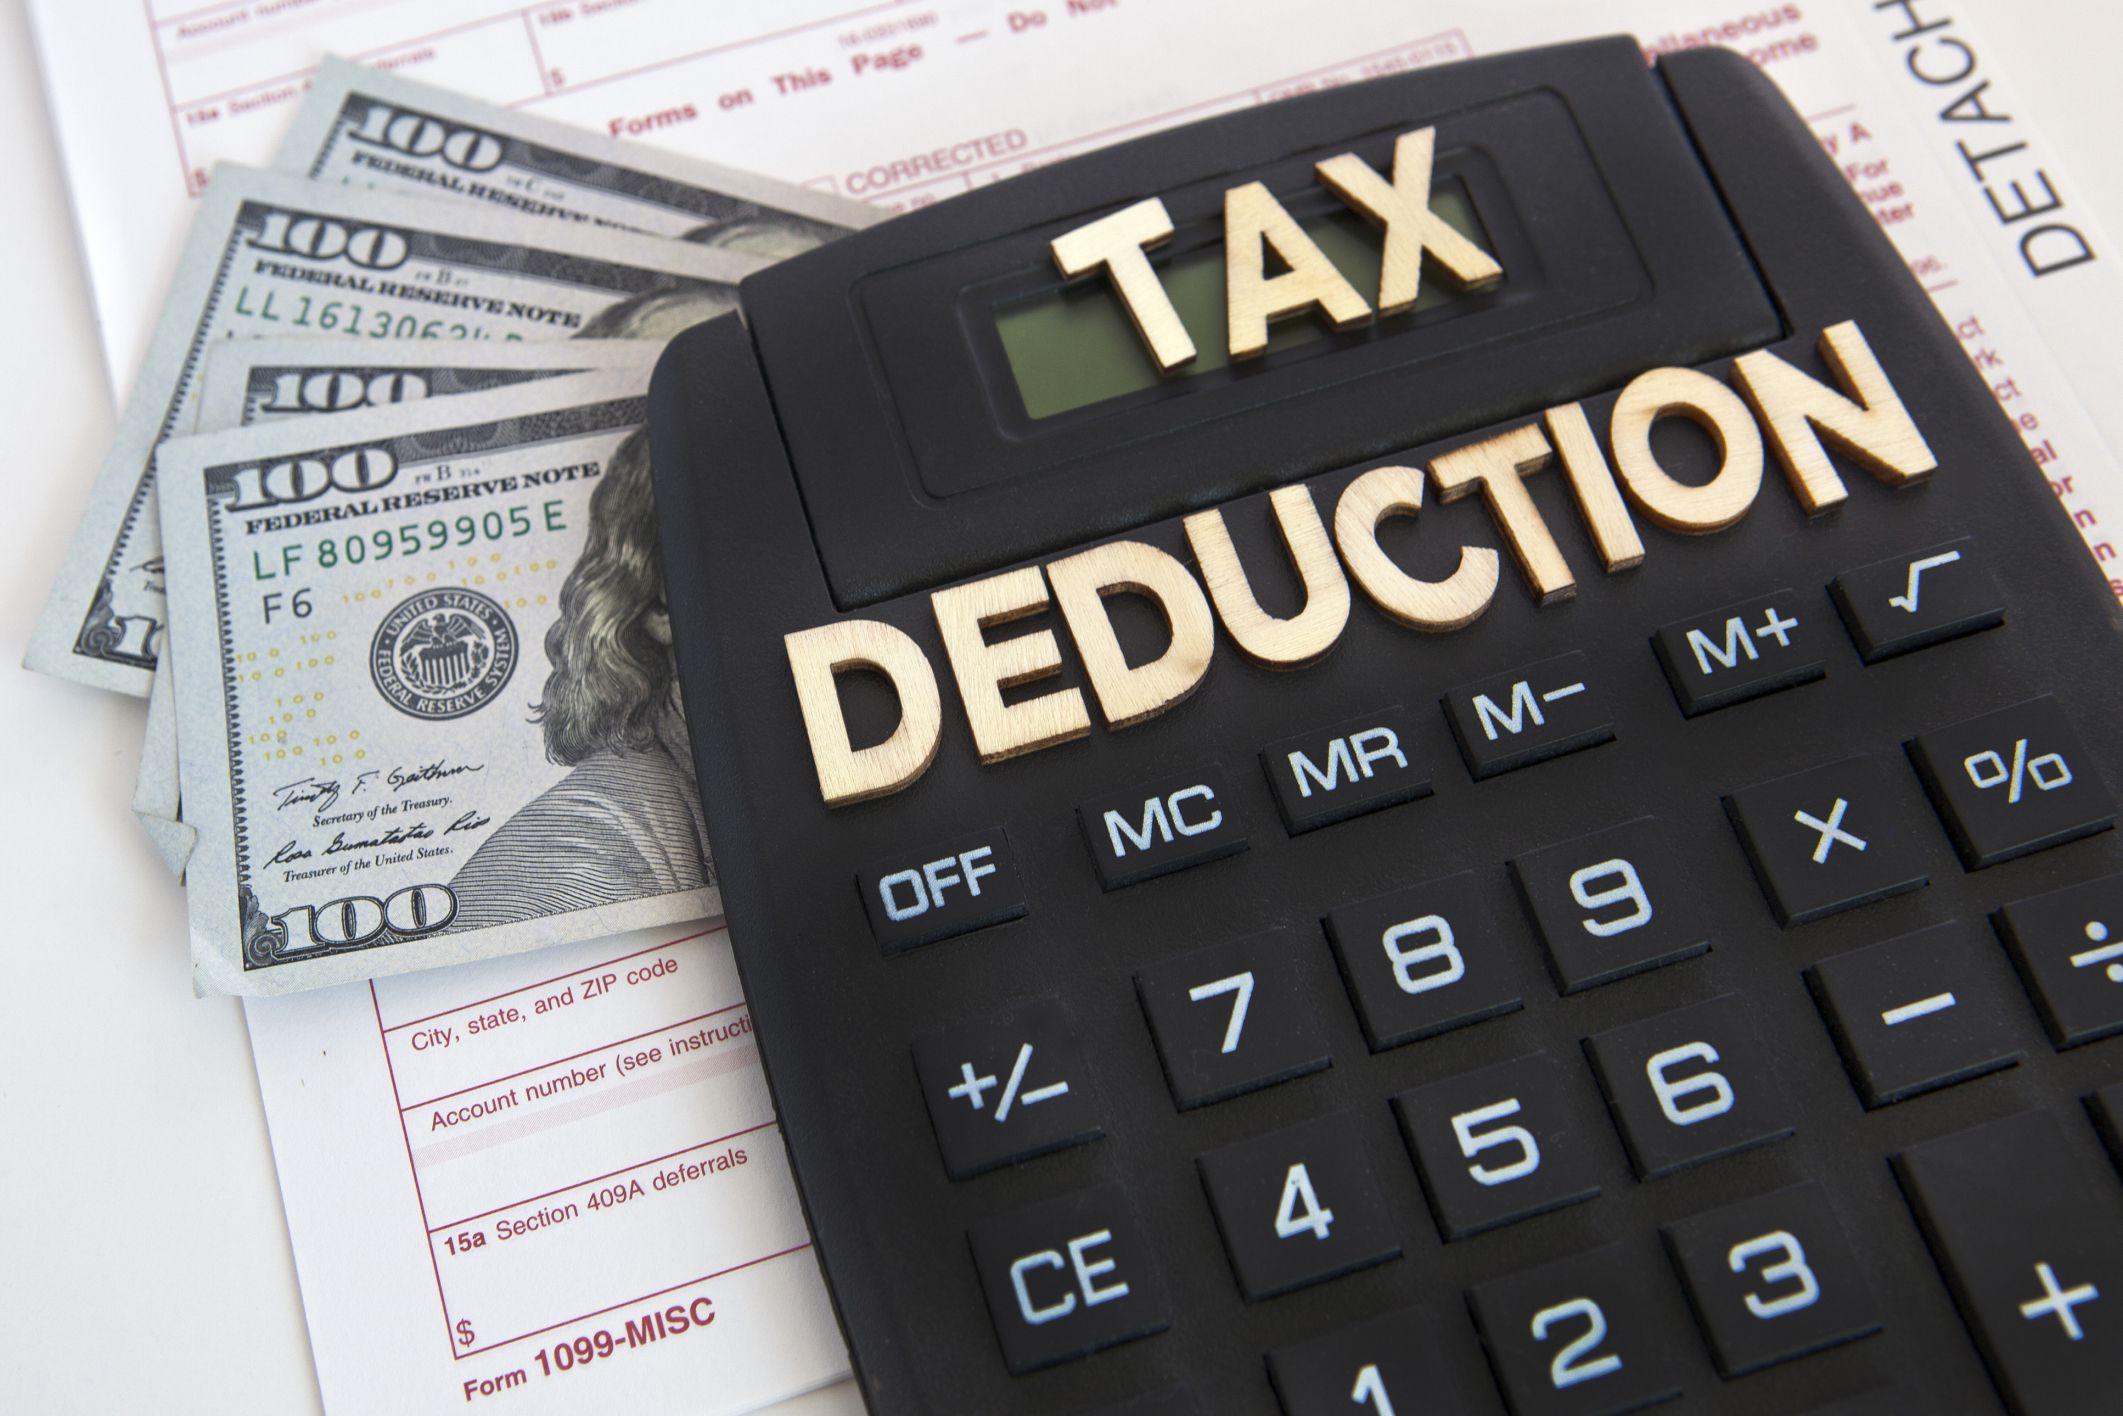 Virginia 529 tax forms - Virginia 529 Tax Forms 32